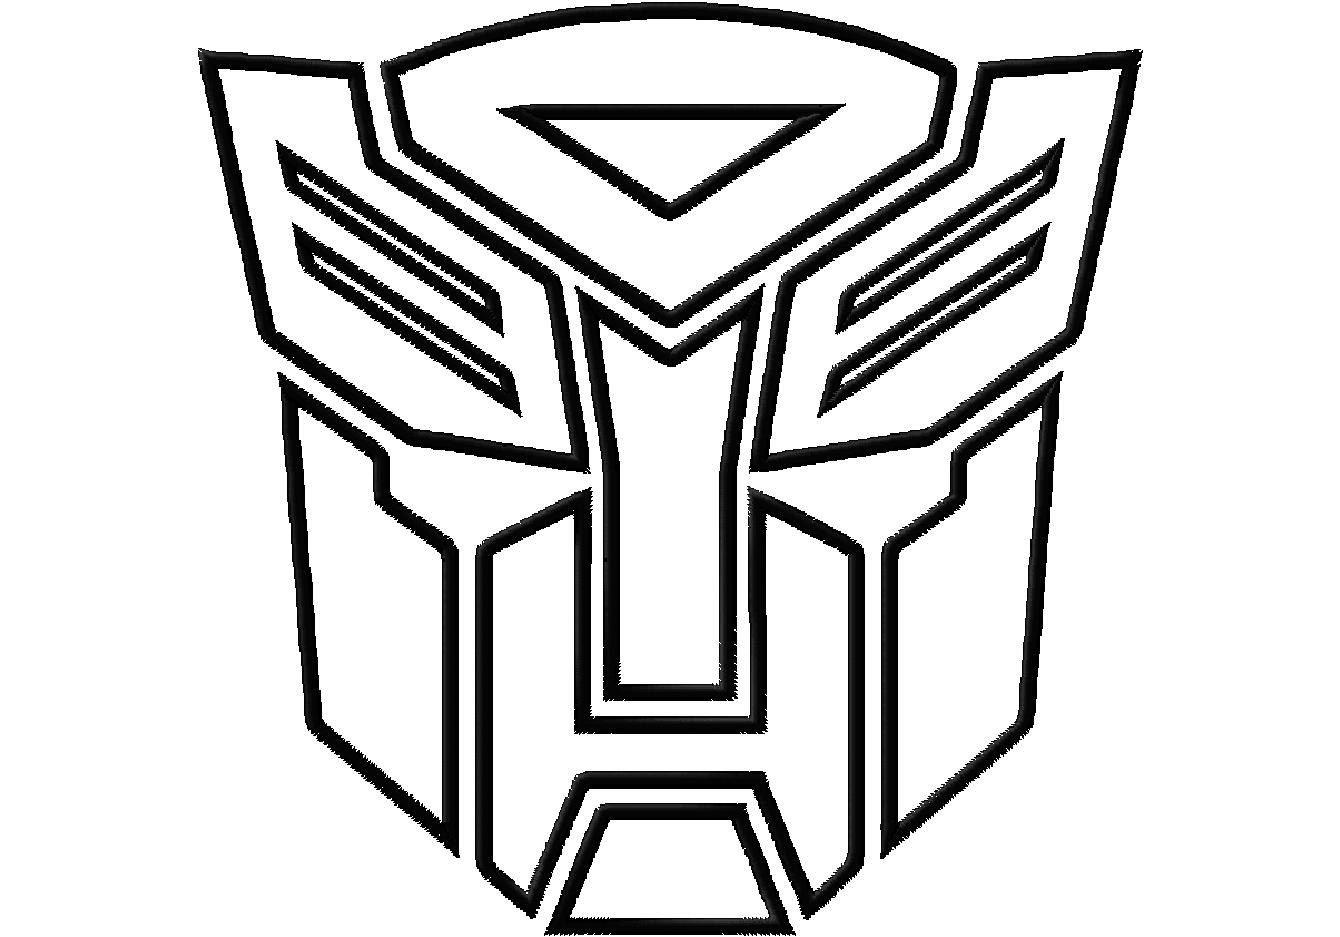 Pin Transformers Logo Stencil Ajilbabcom Portal on Pinterest.